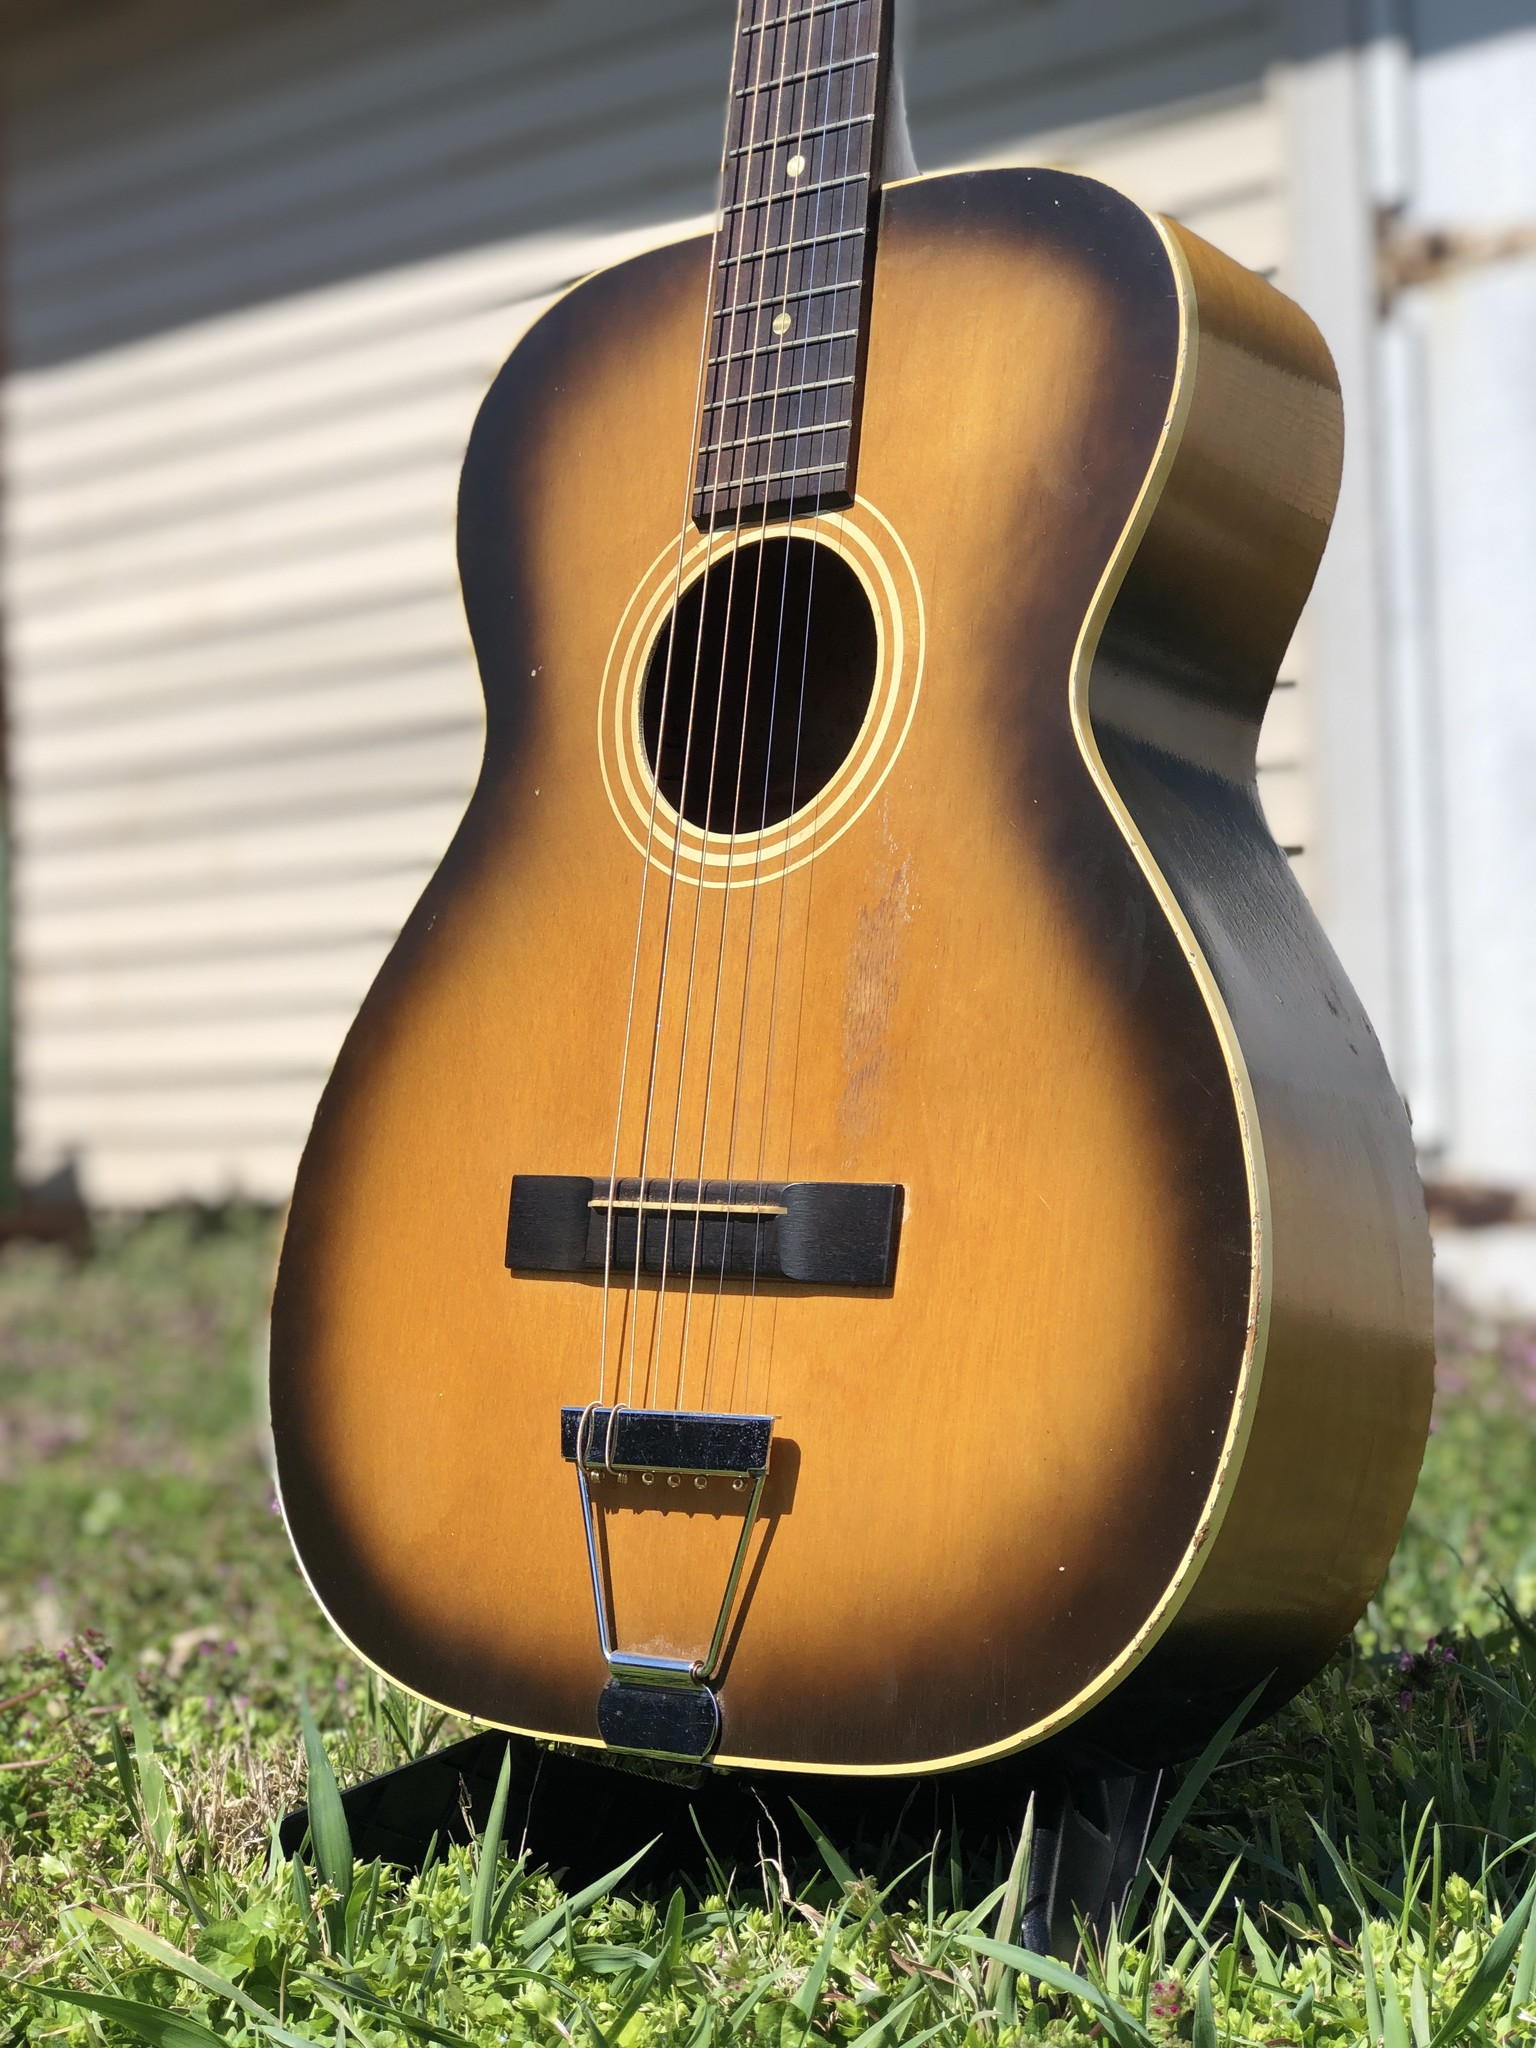 1960s Stella 12-string (strung up for 6 string) 7164 H922-3